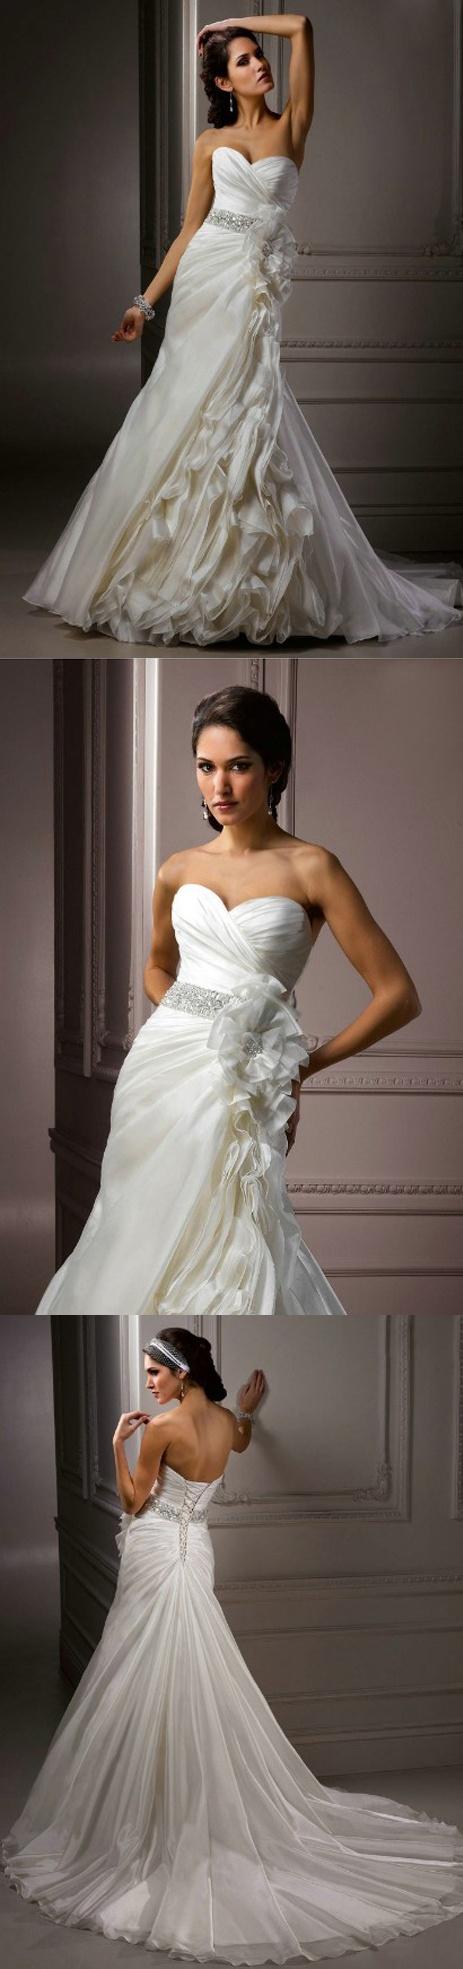 $209.99  Wedding Popular Ivory Organza Sweetheart Handmade Flowers Bridal Dresses 2013 With Crystal